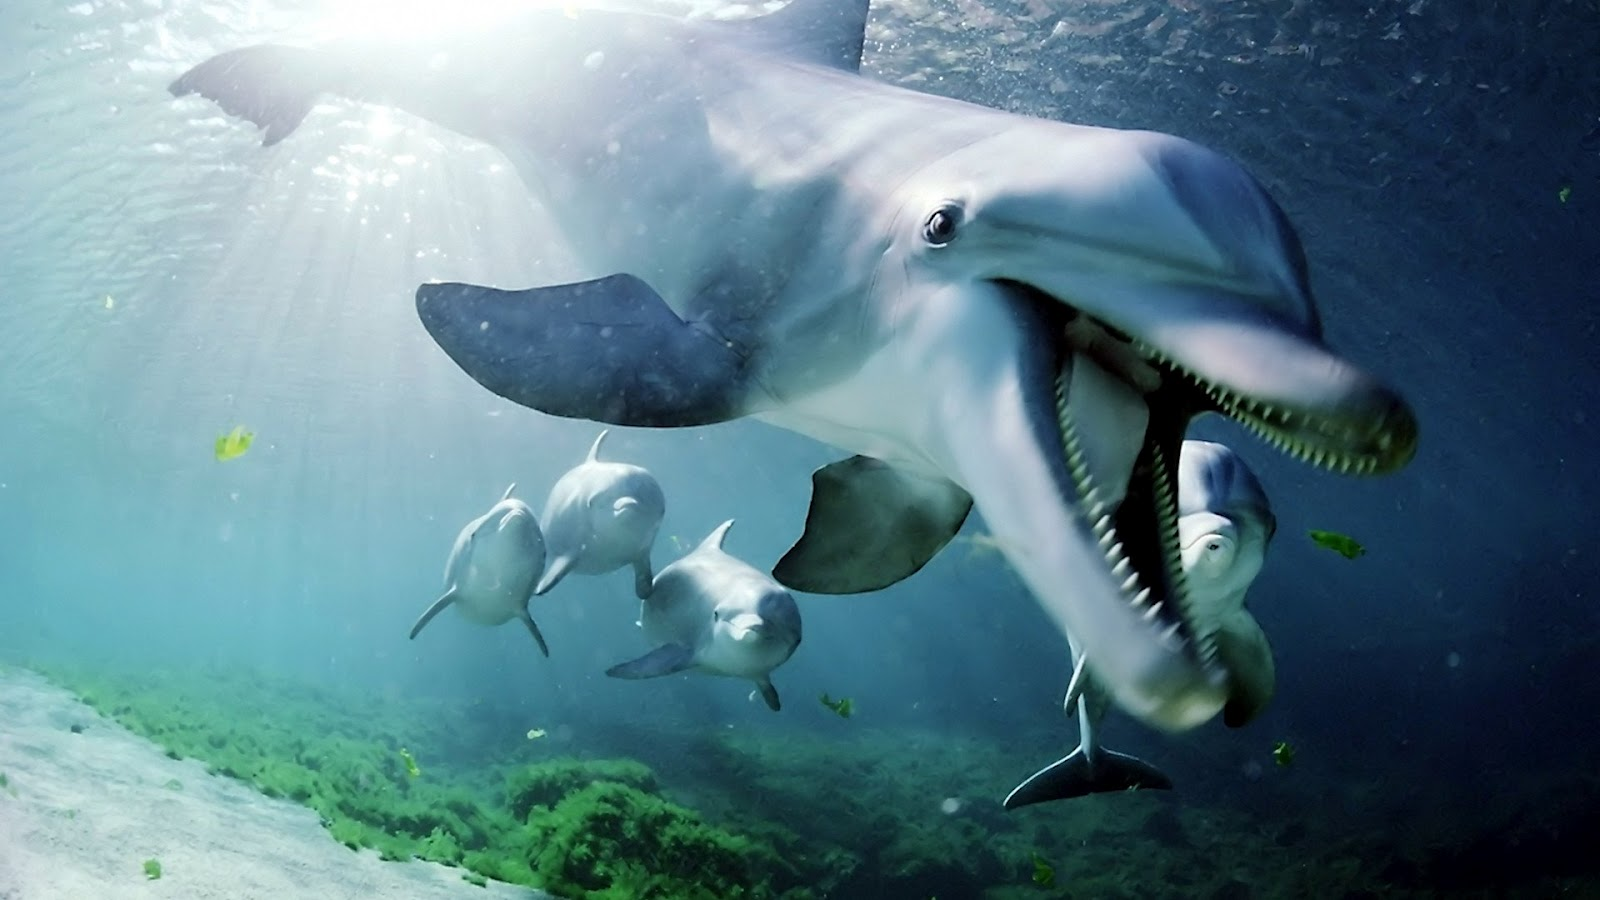 Dolphin | Full HD Desktop Wallpapers - 133.4KB